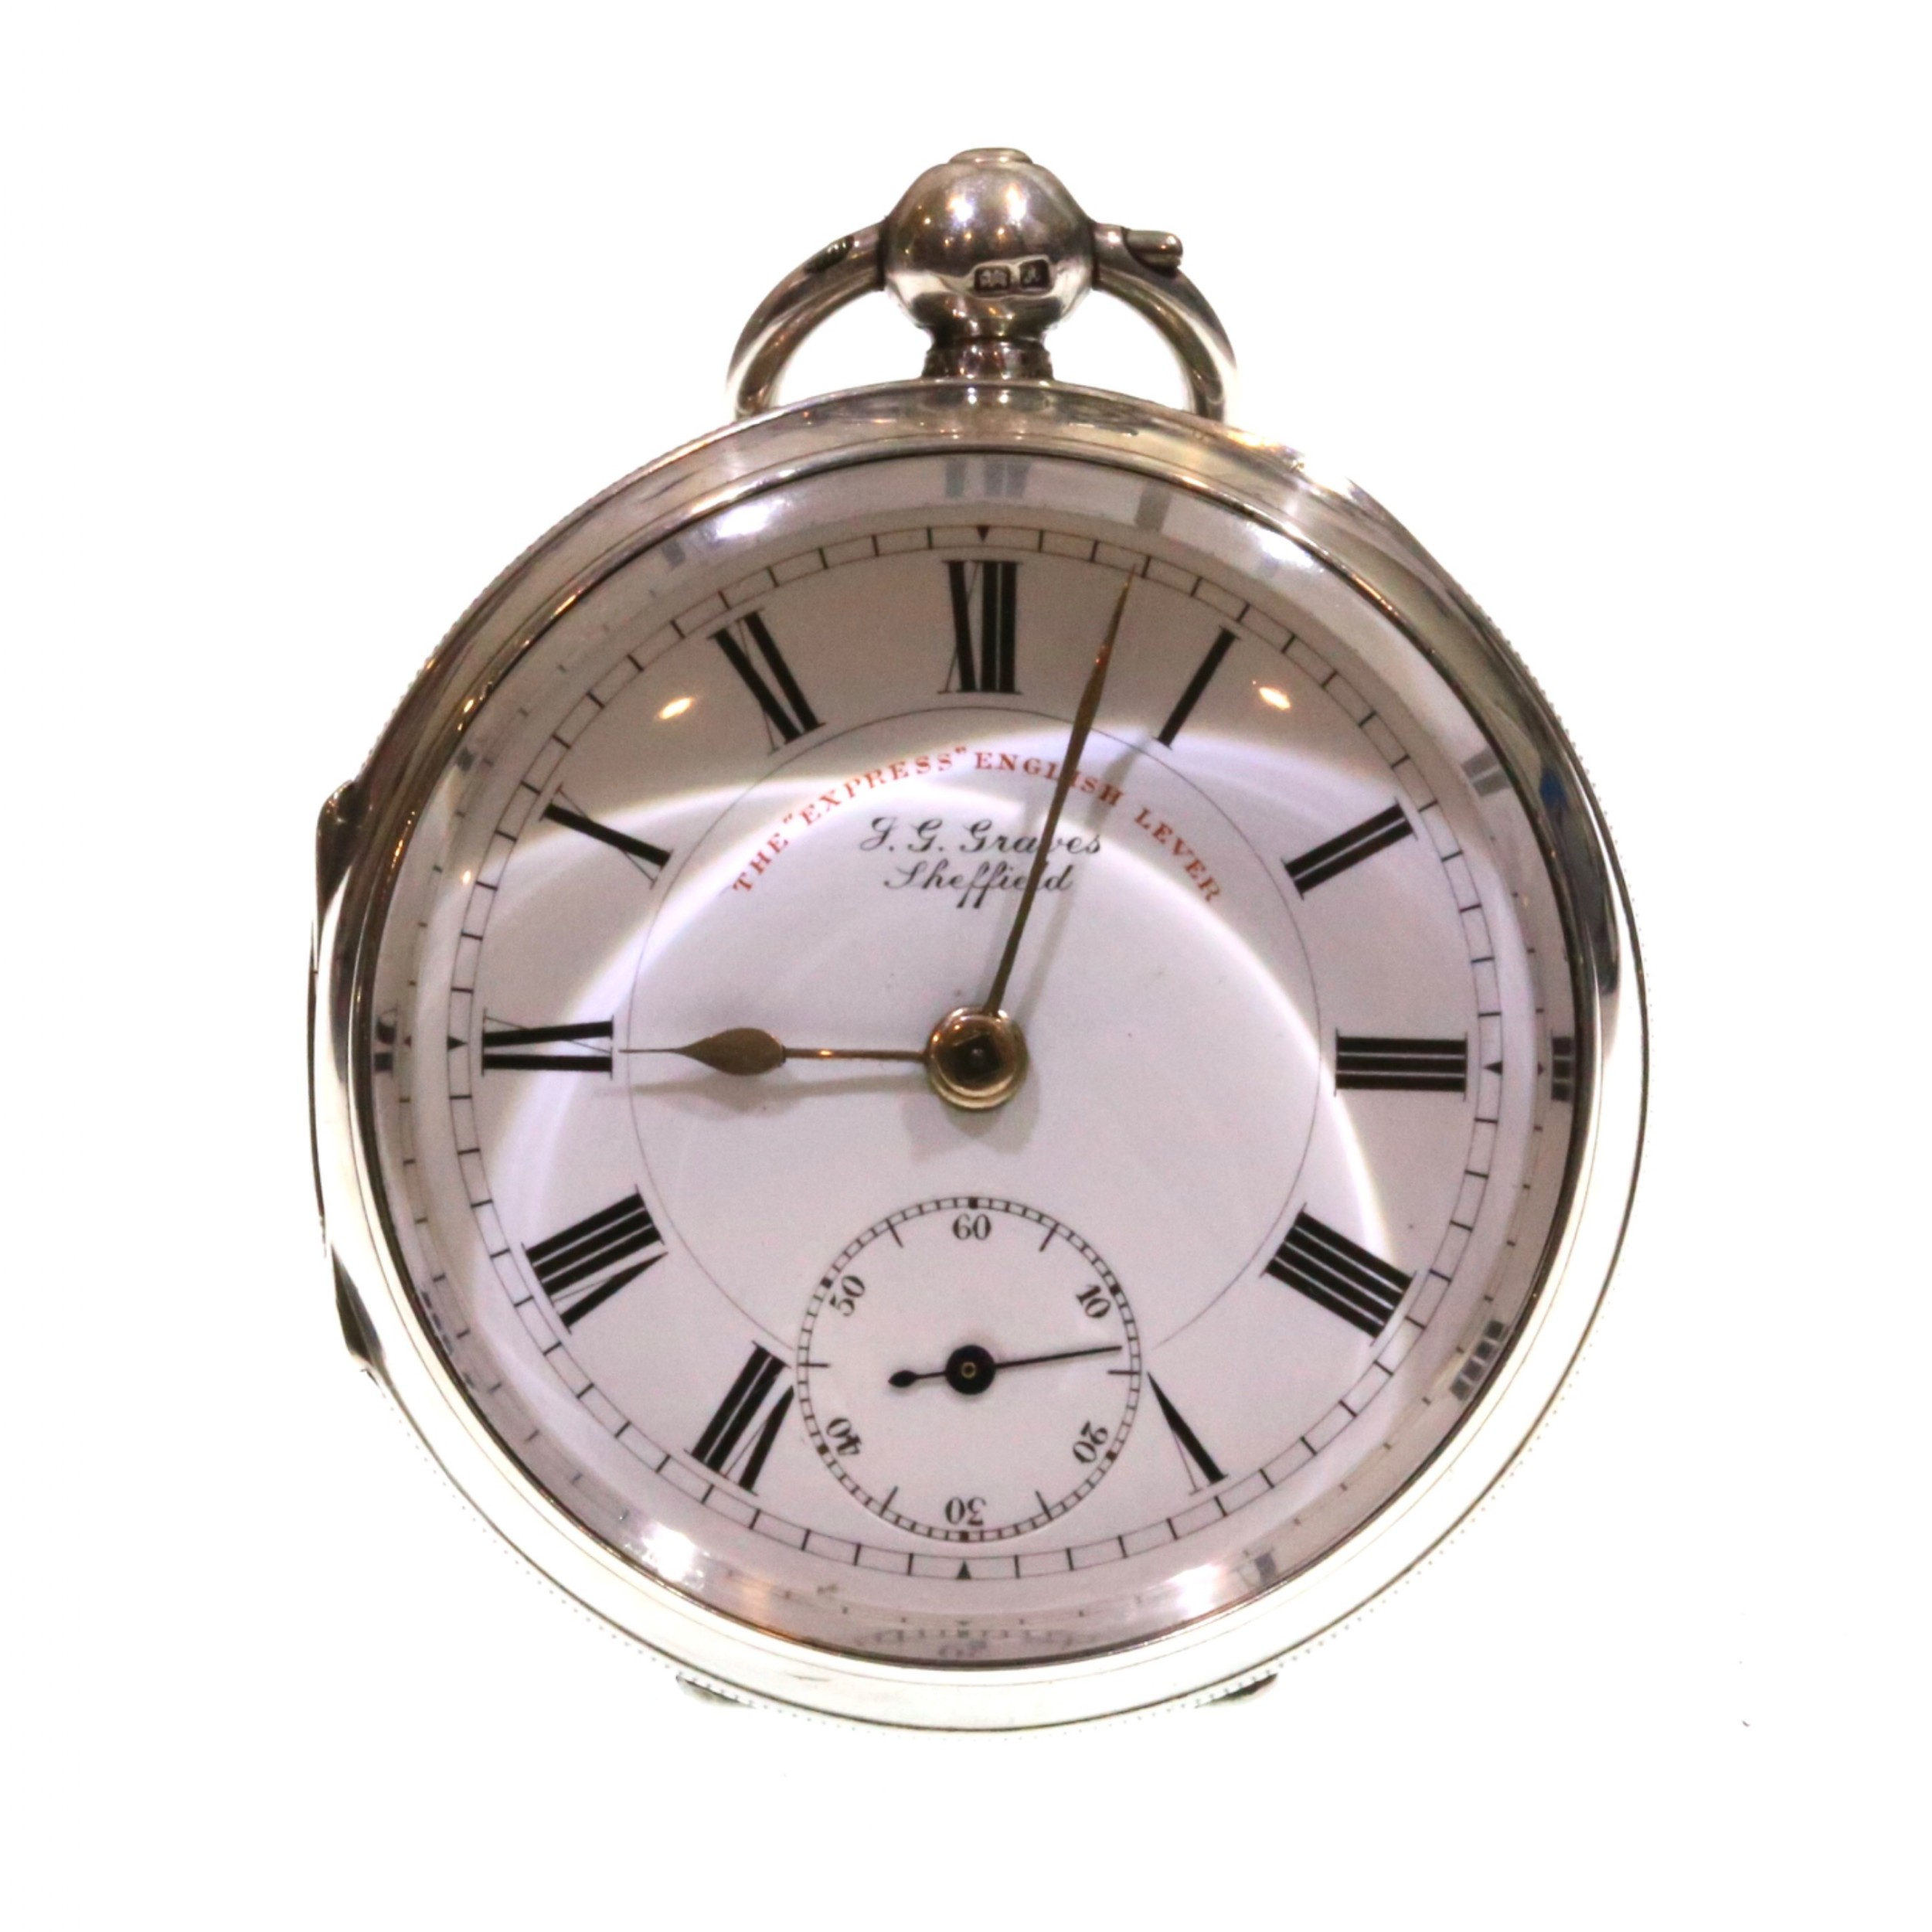 1901 jg graves silver lever pocket watch